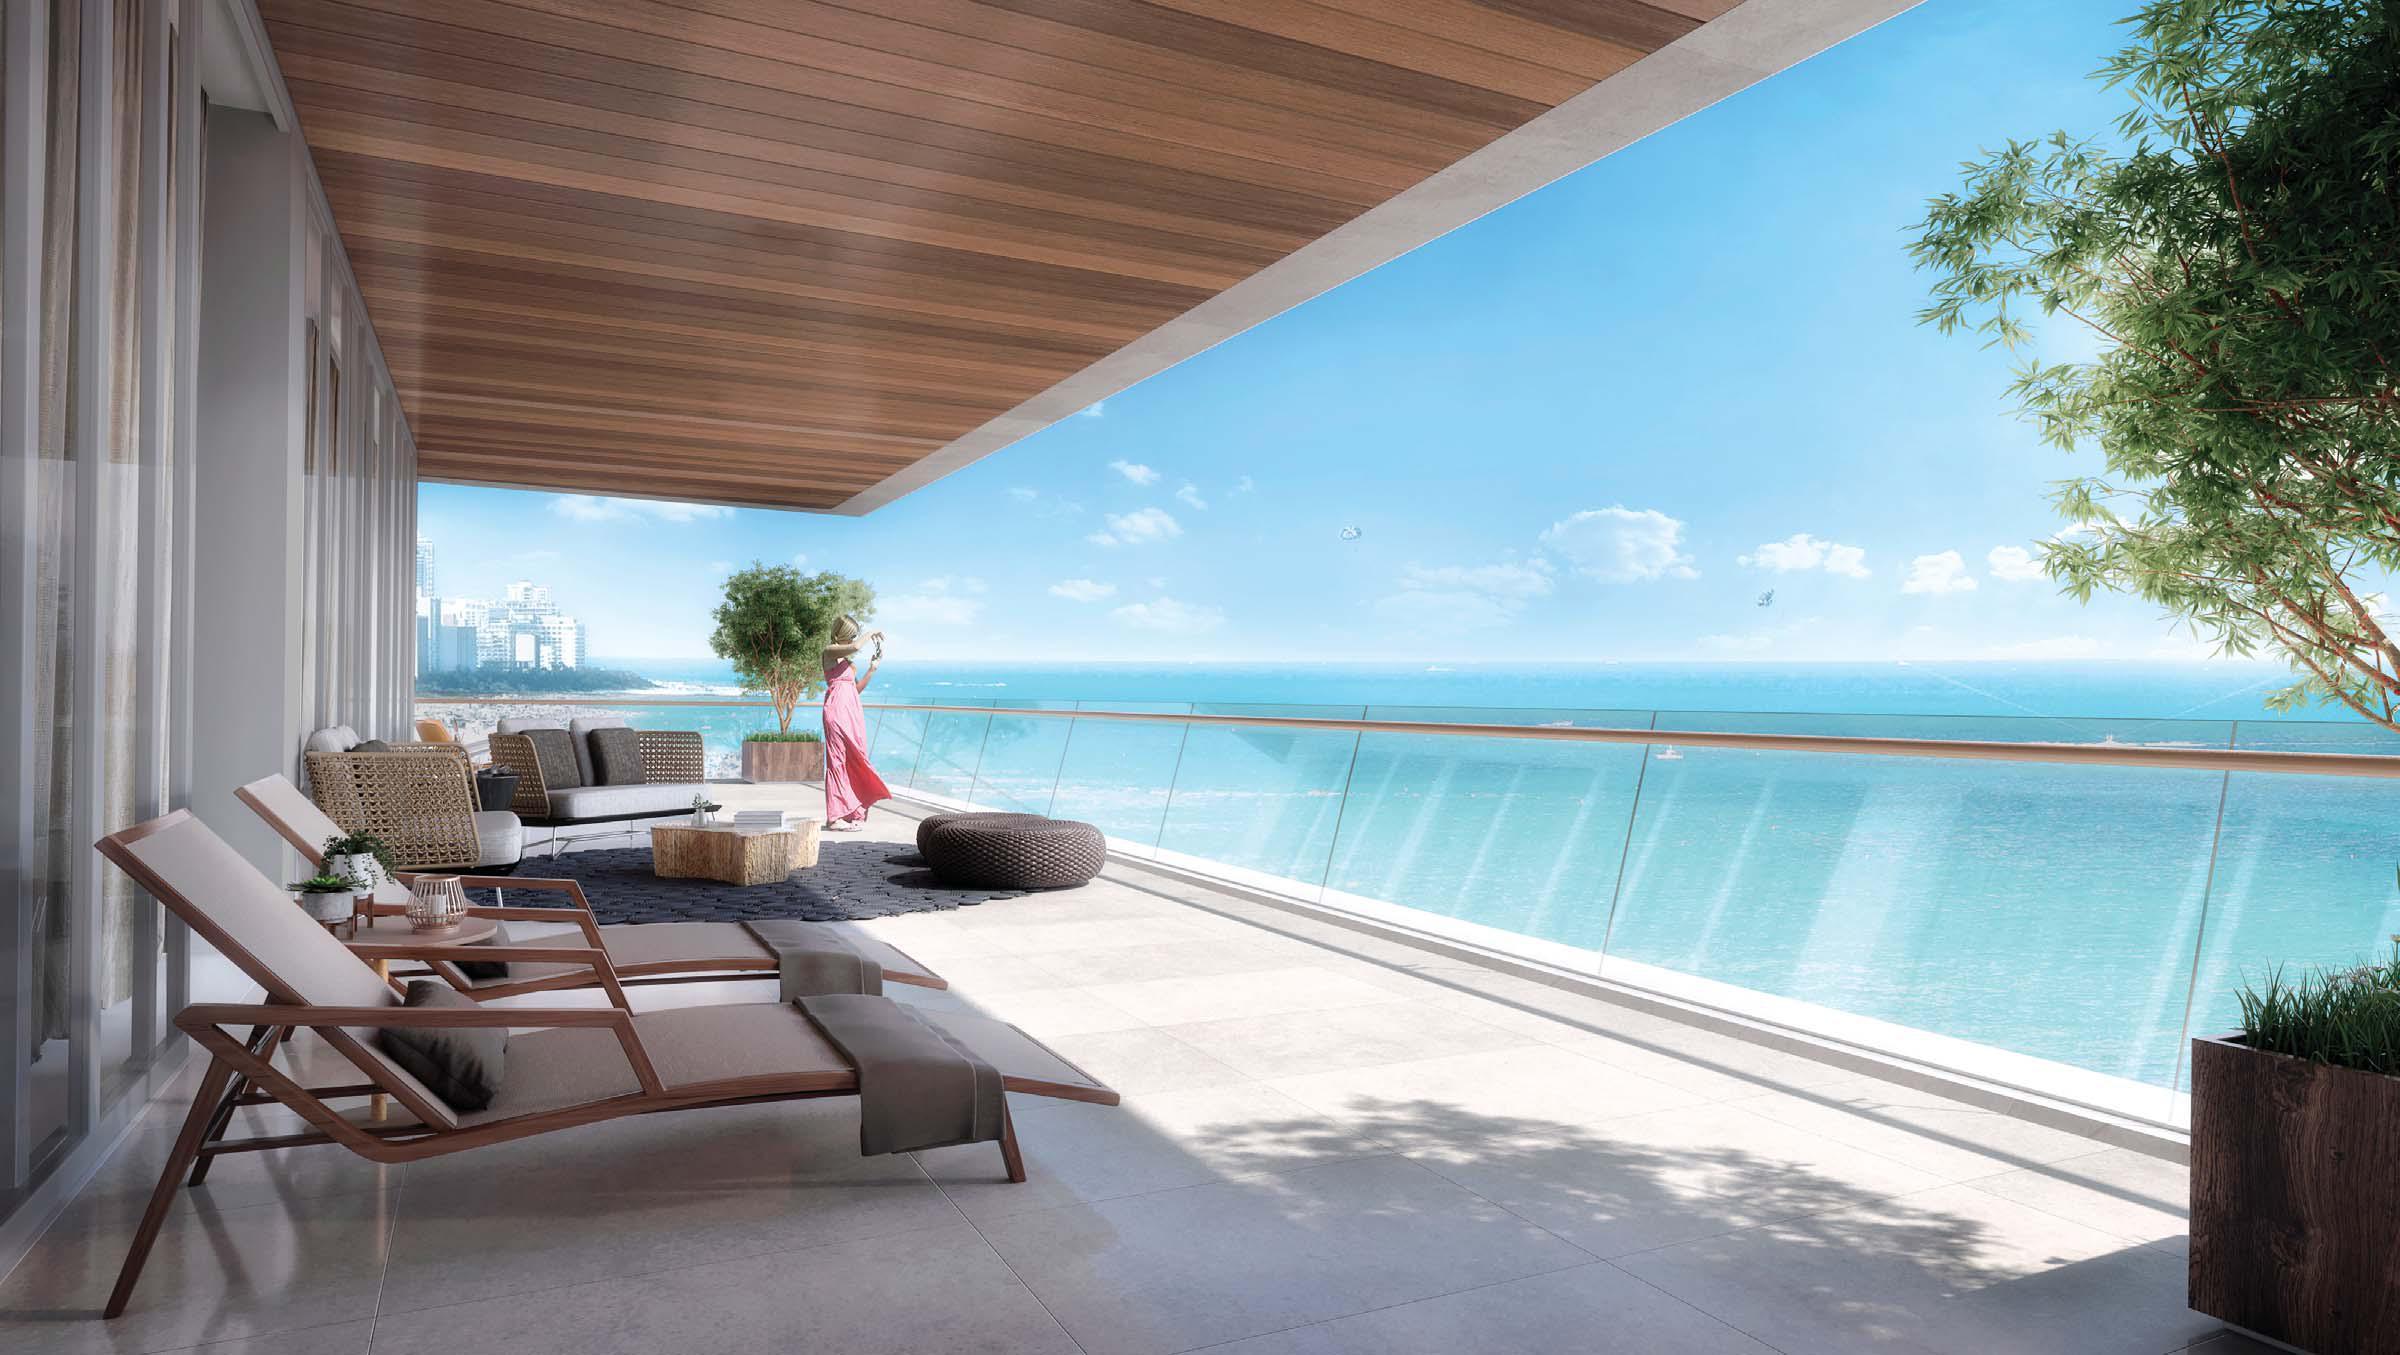 Rendering of a planned condo in Miami Beach